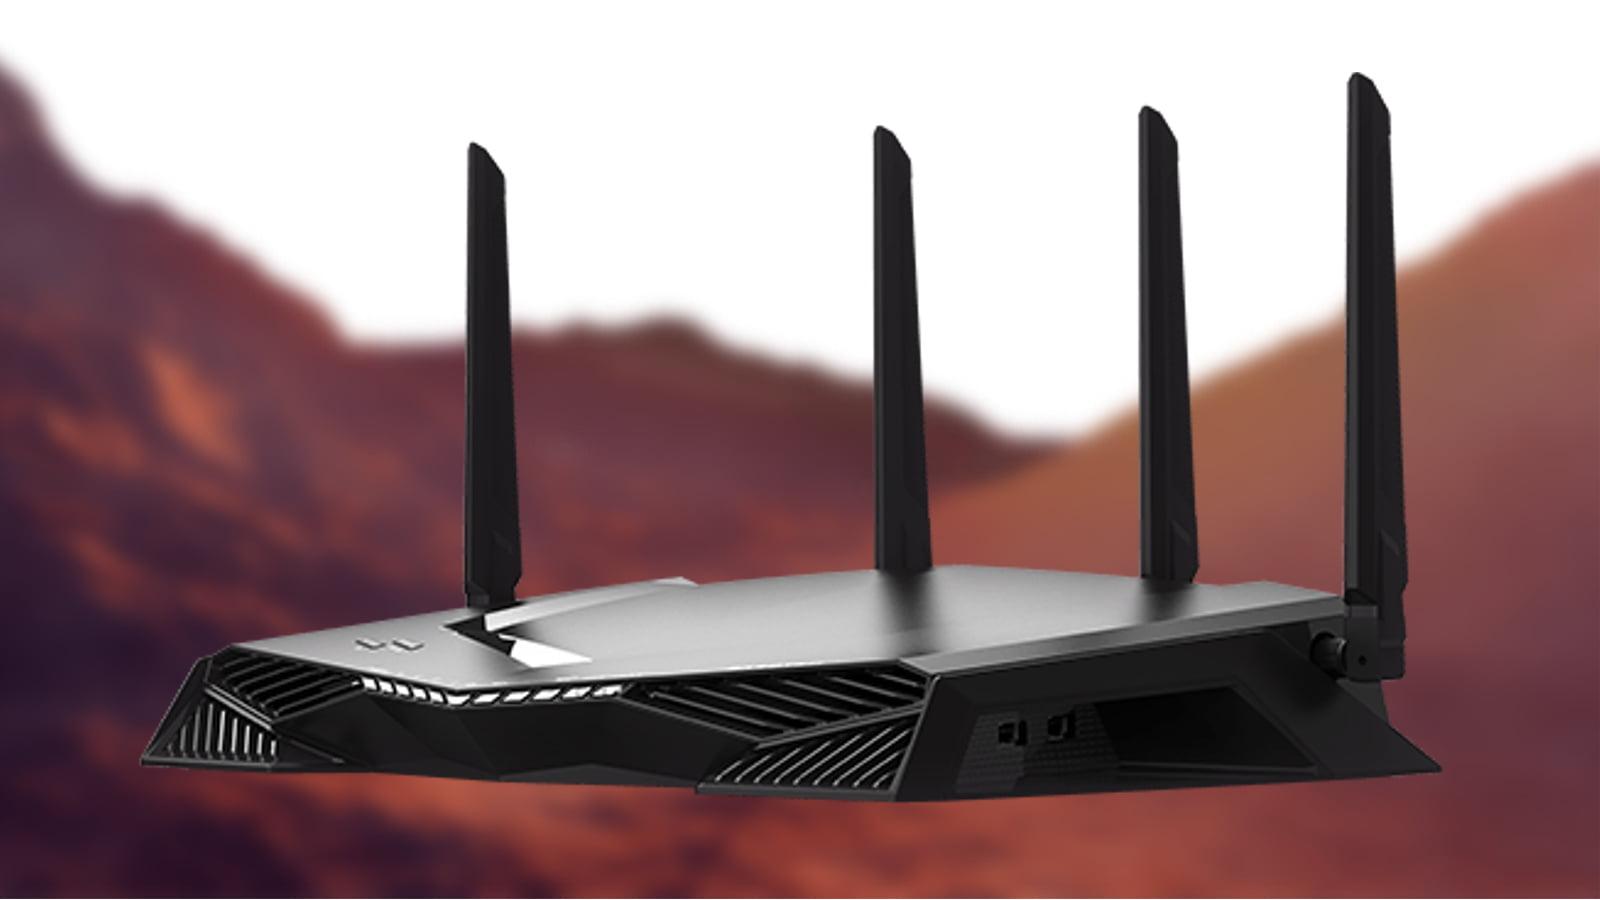 CES 2018 出現兩款「電競級」無線路由器,Linksys WRT32XB 對比 Netgear XR500 各有亮 ...